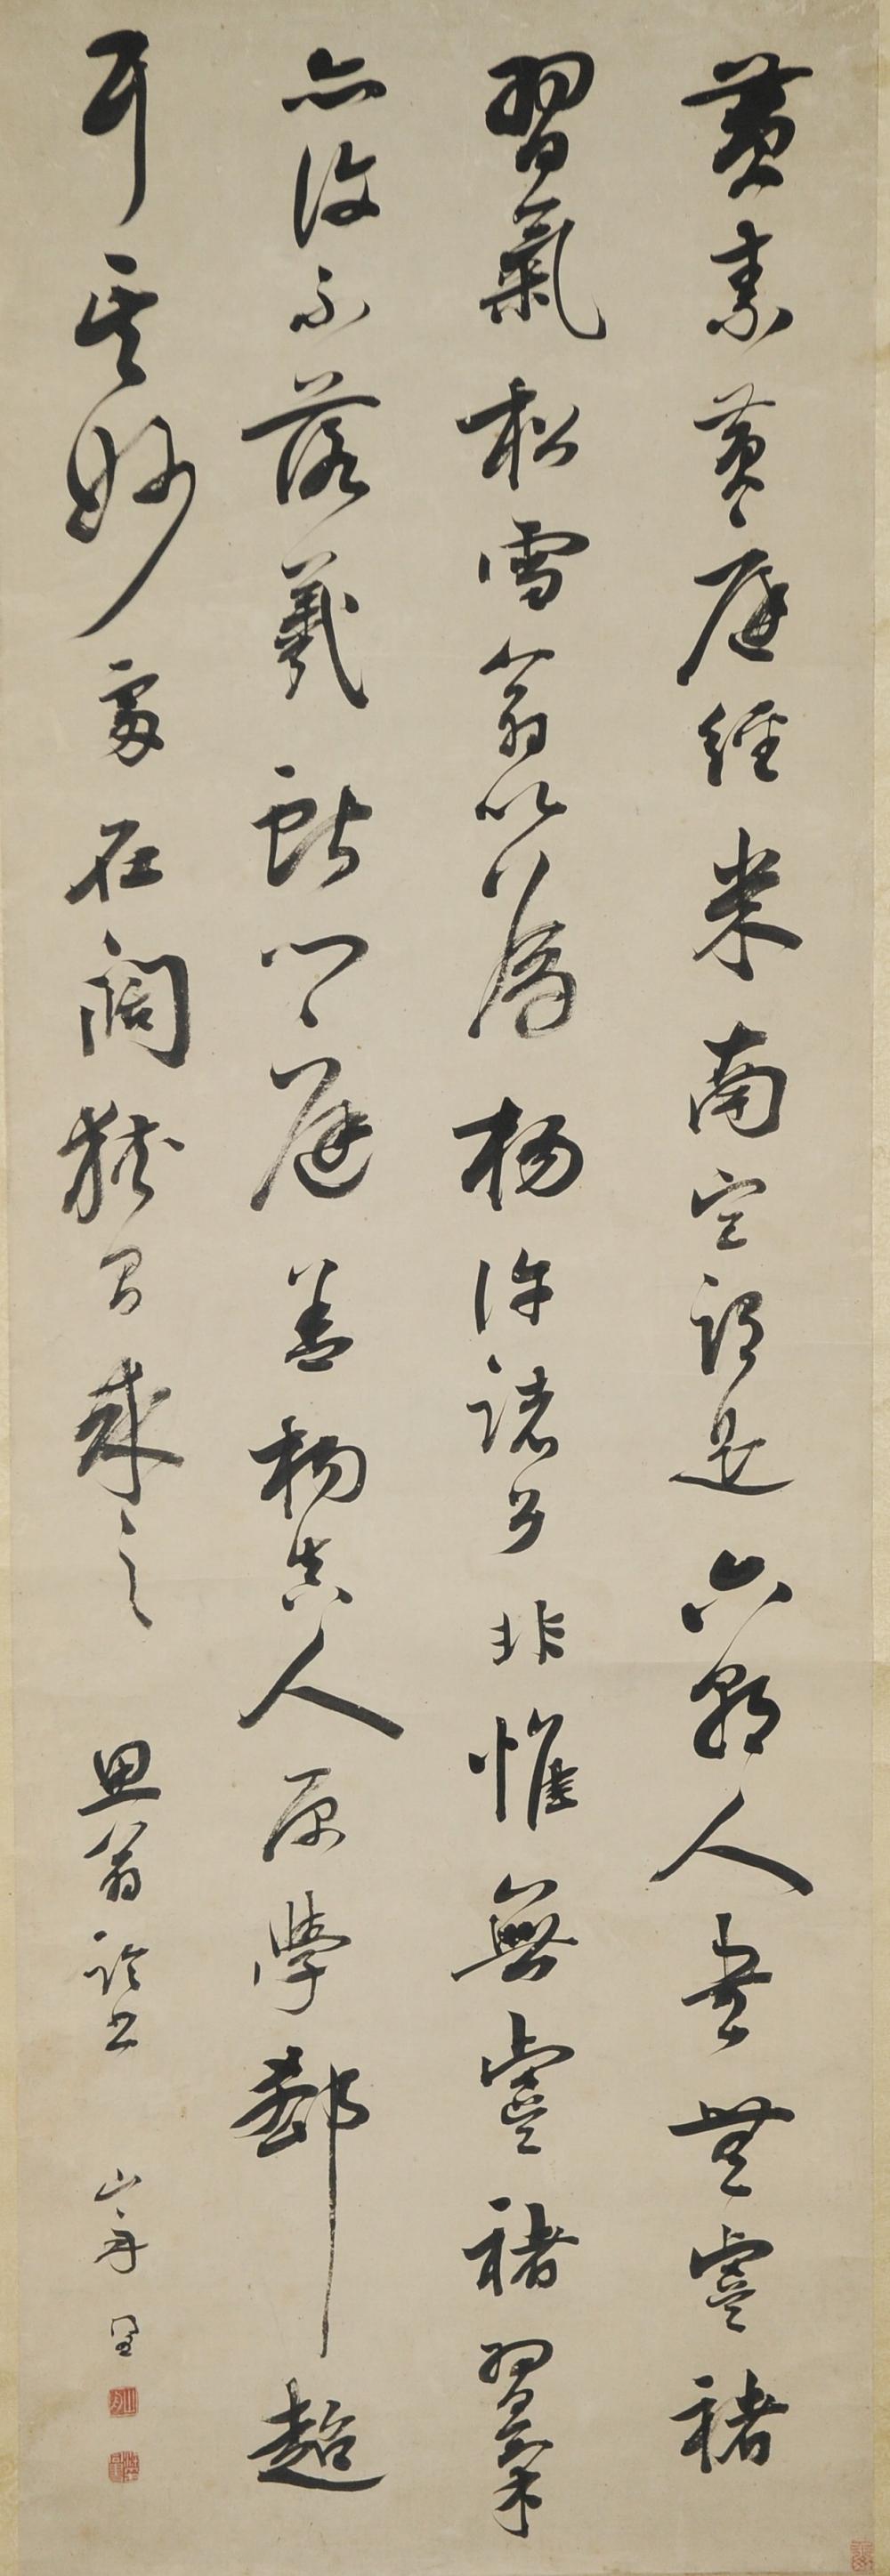 CHINESE CALLIGRAPHY, LIANG TONGSU (1723-1815)